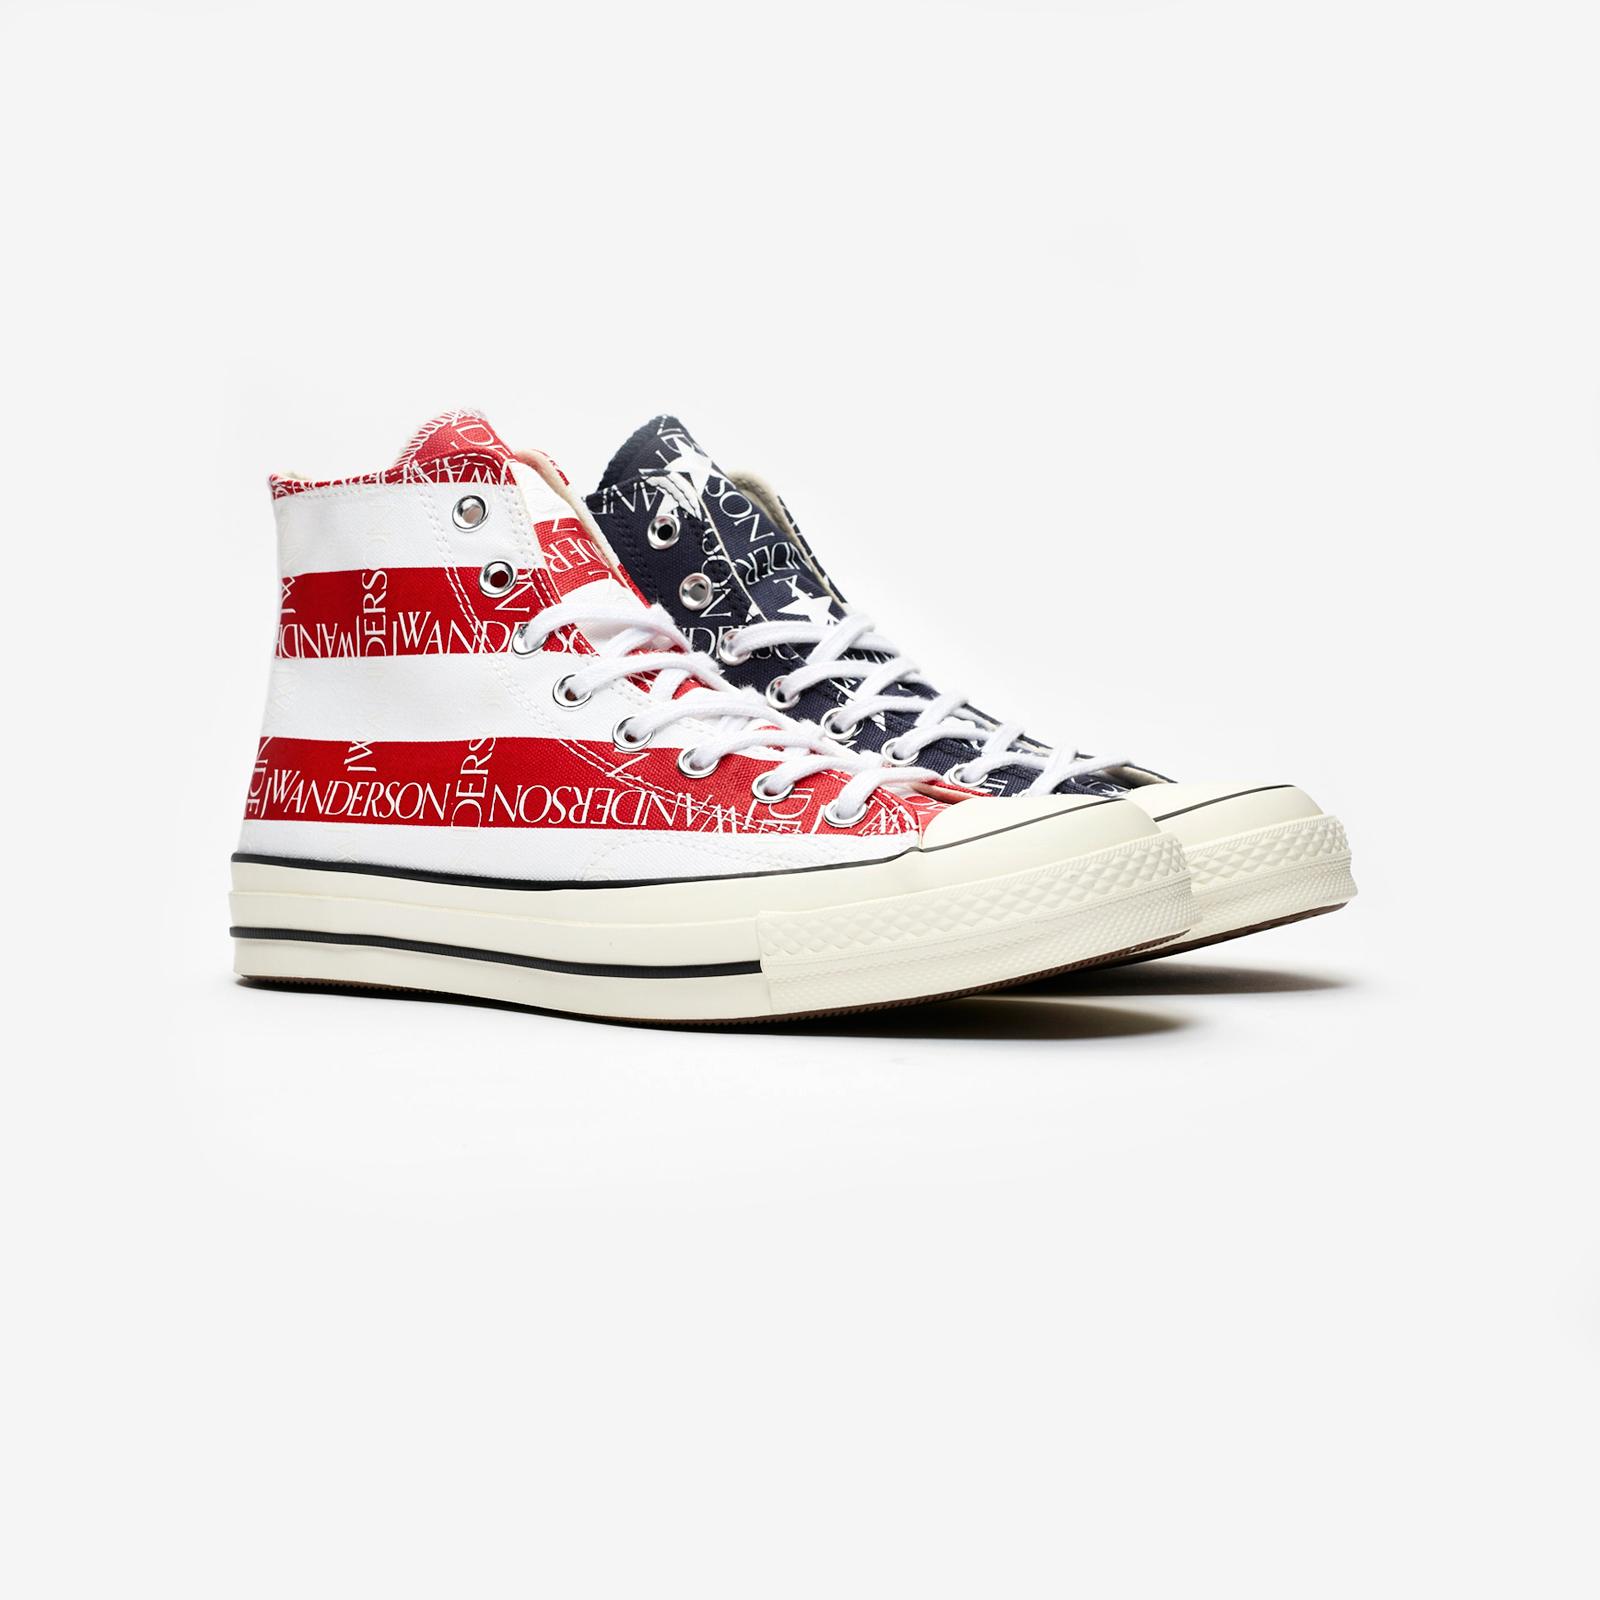 bcdb32a9606 Converse Chuck 70s Hi x JW Anderson - 164841c - Sneakersnstuff ...